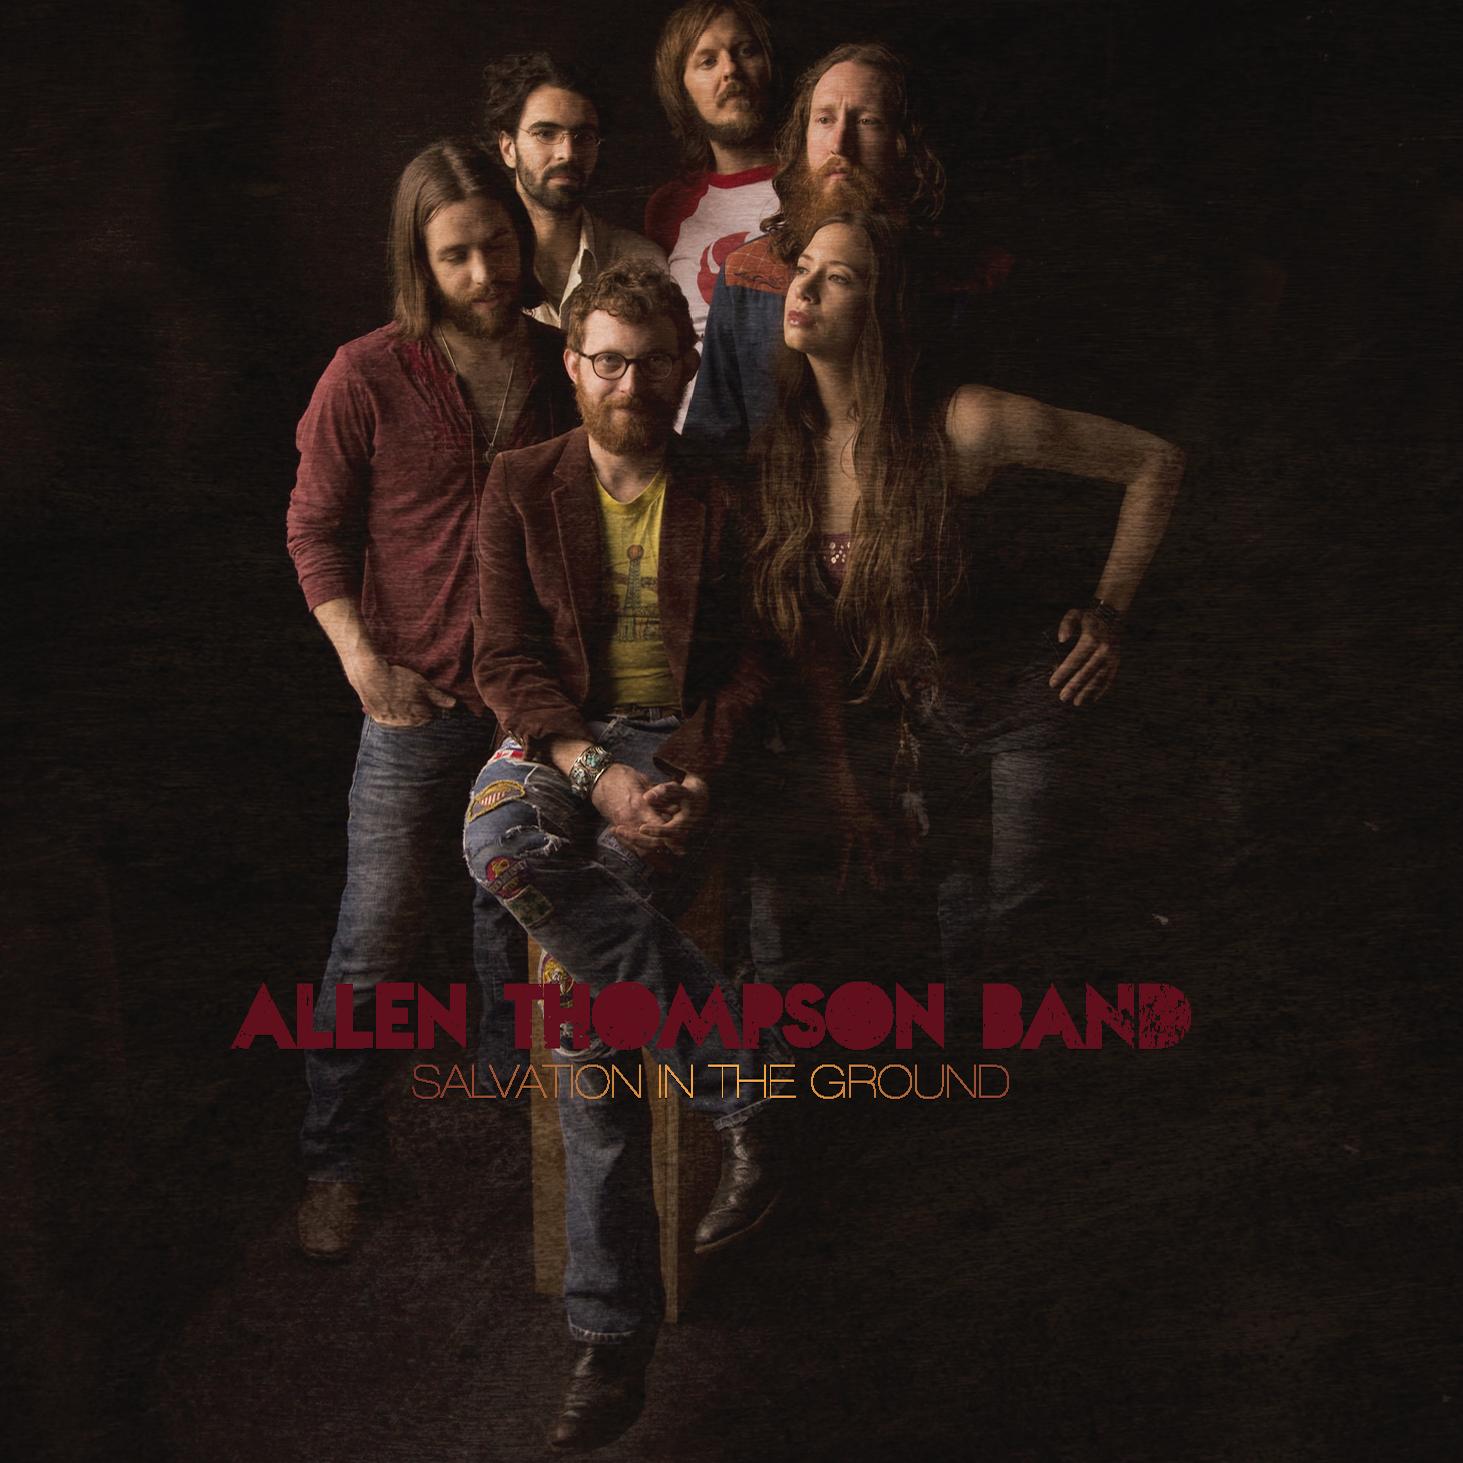 Allen Thompson Band - Salvation In The Ground CD 00006